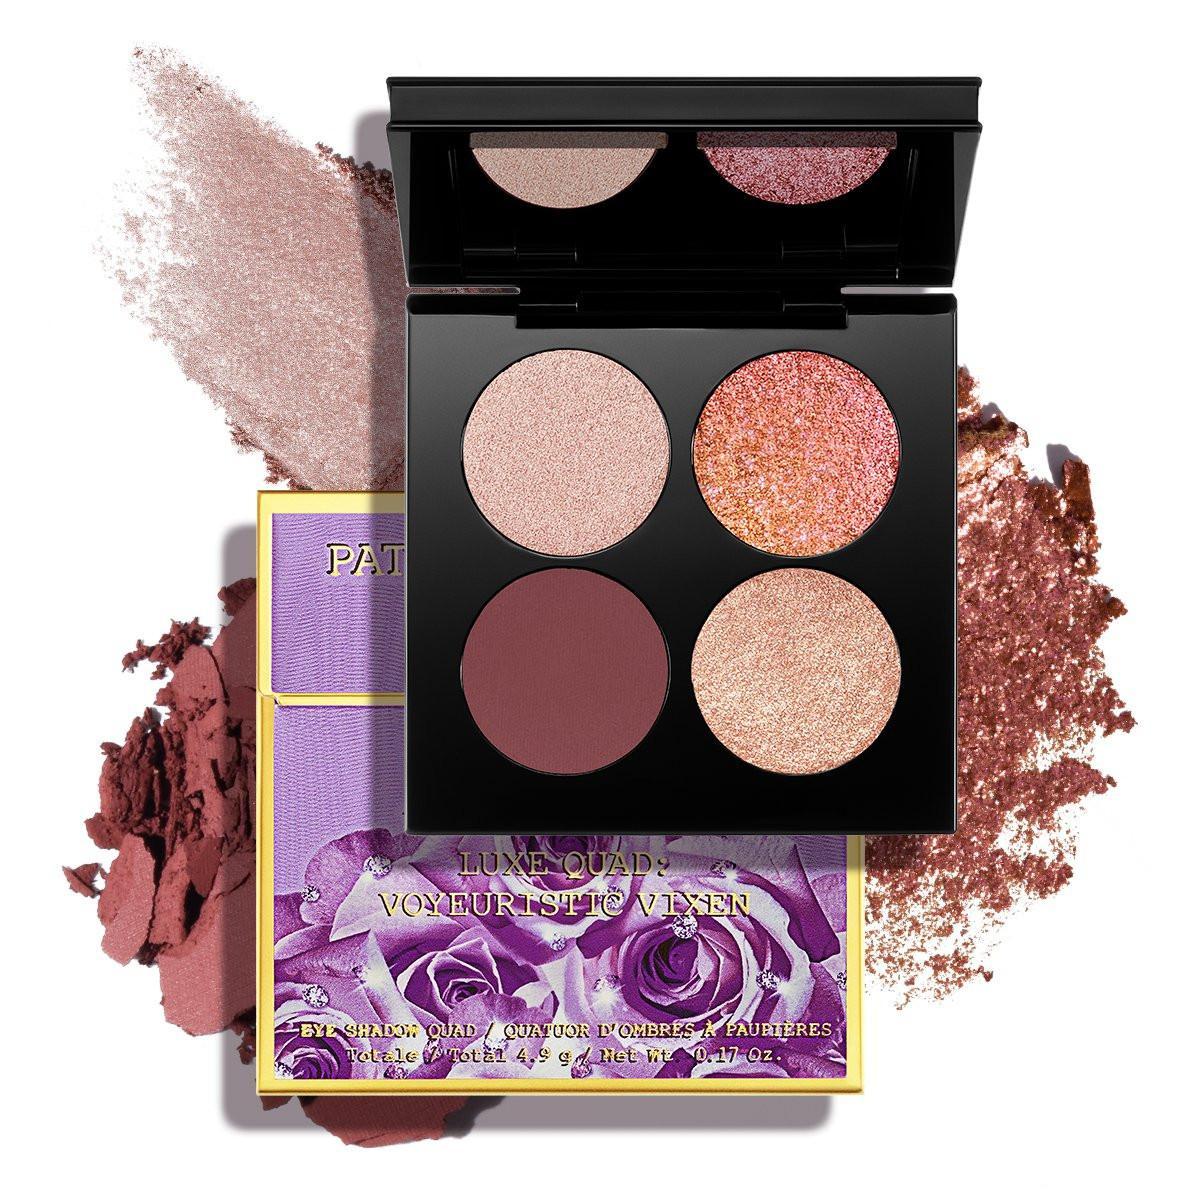 Pat McGrath Divine Blush Collection Venus in Fleurs Luxe Quad Voyeuristic Vixen With Crushes